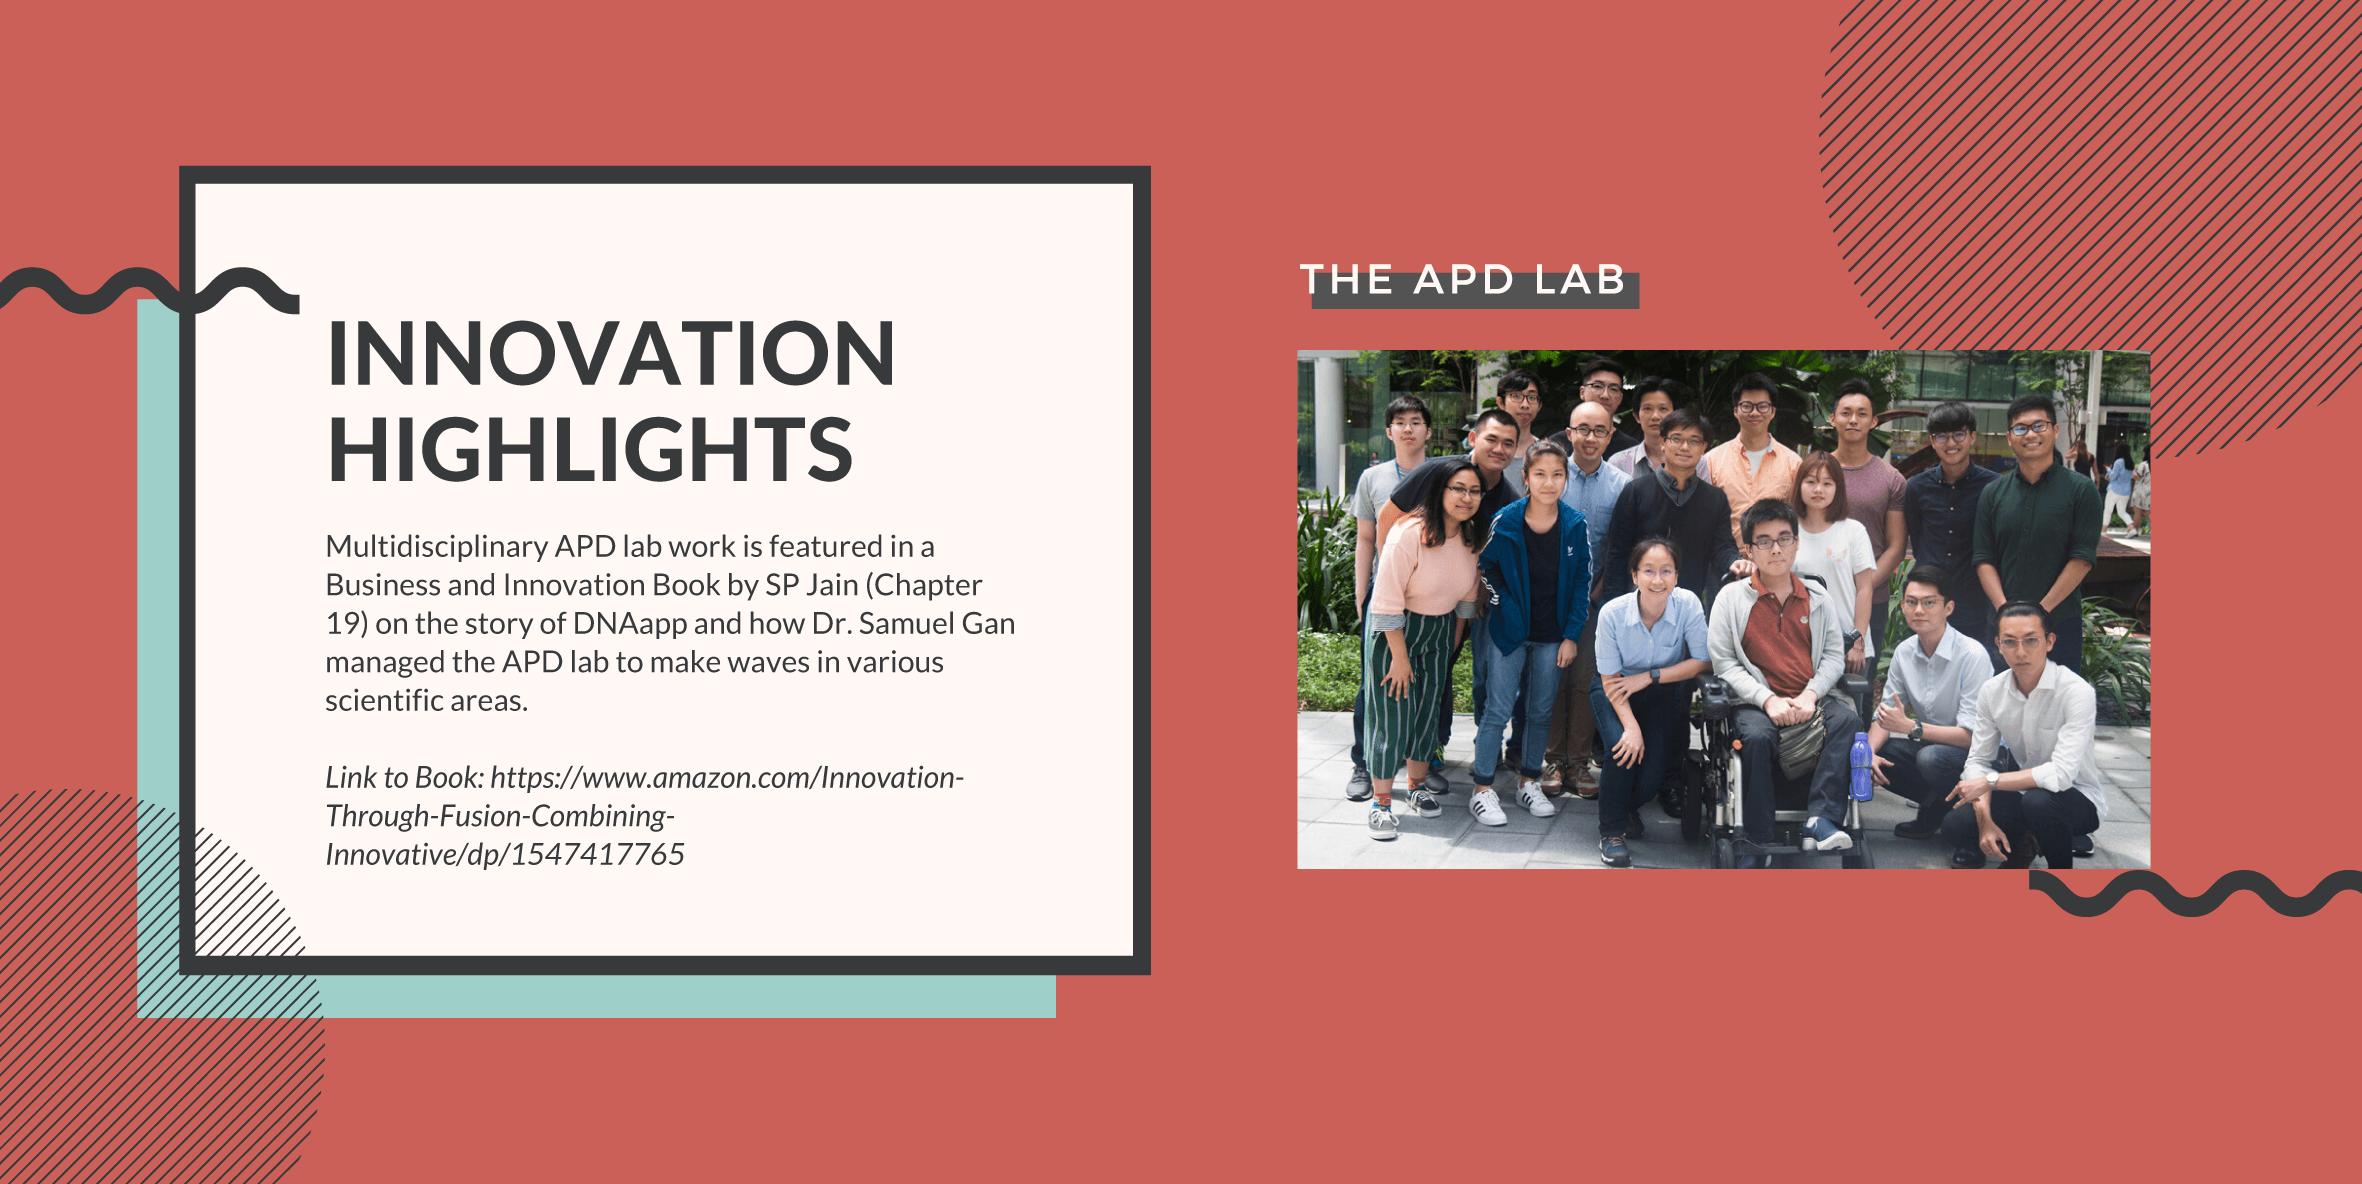 BII - APD Lab Innovation highlights